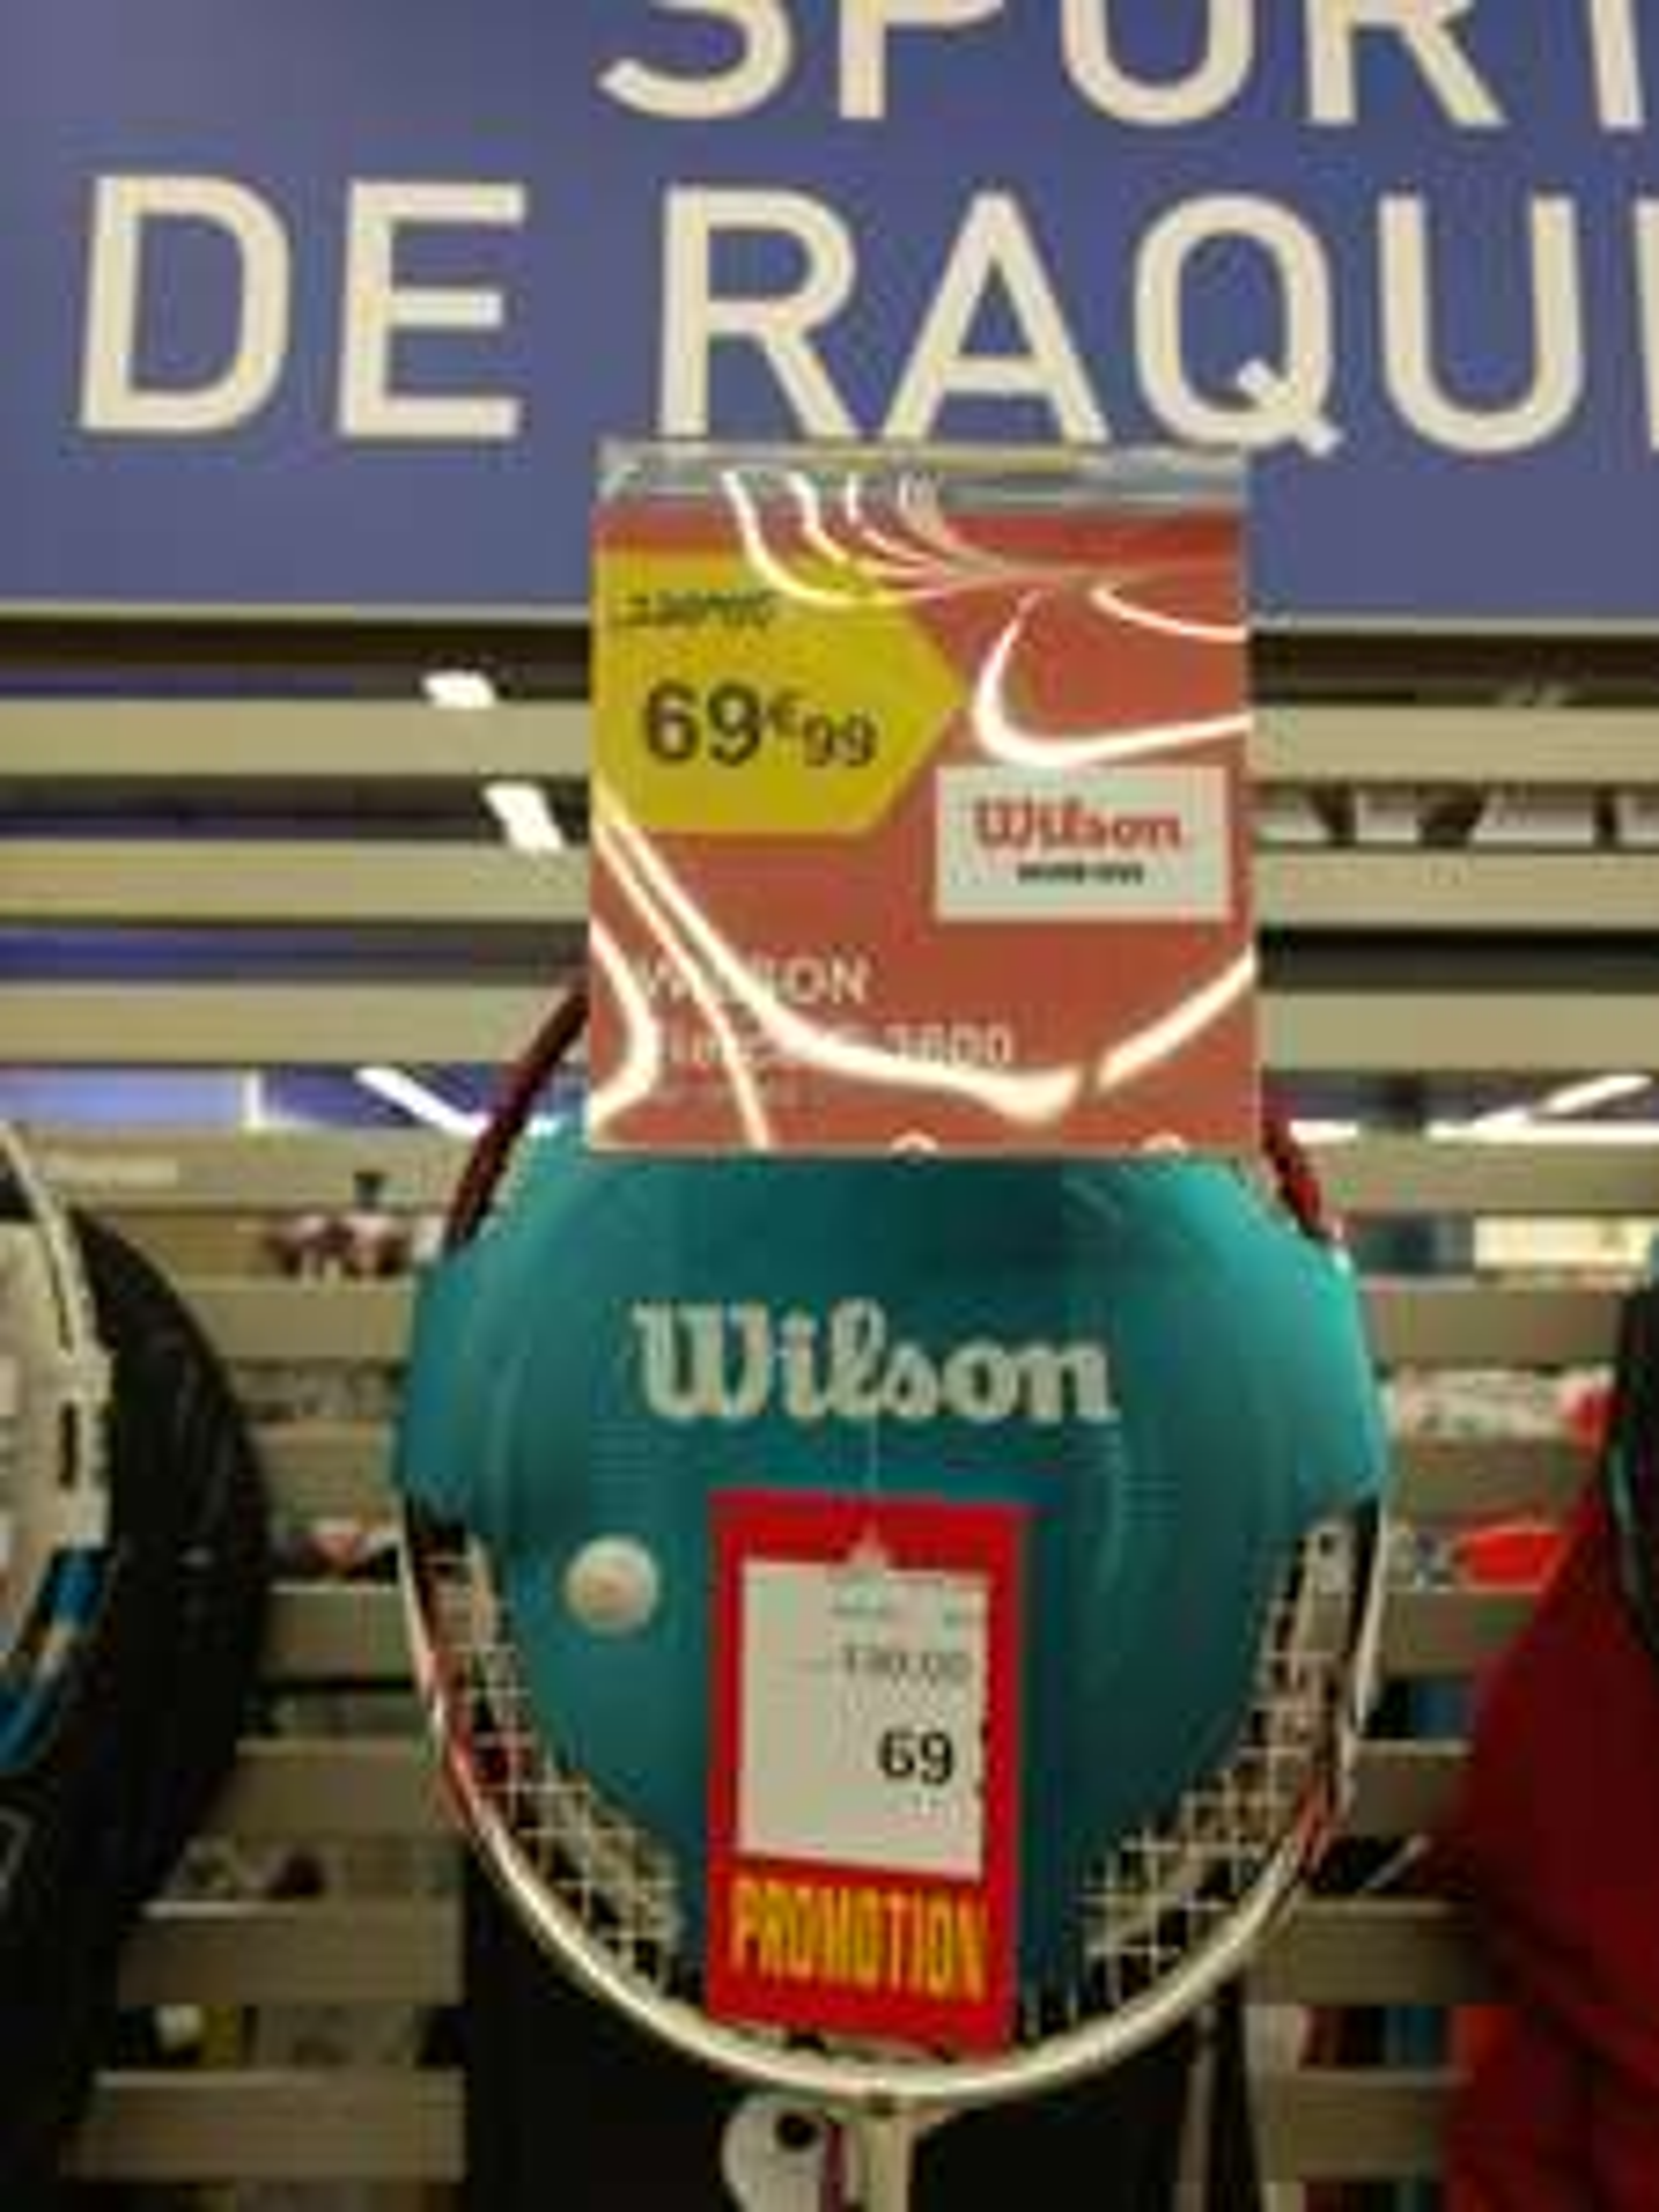 Raquette de badminton Wilson Fierce C3600 - Glisy (80)